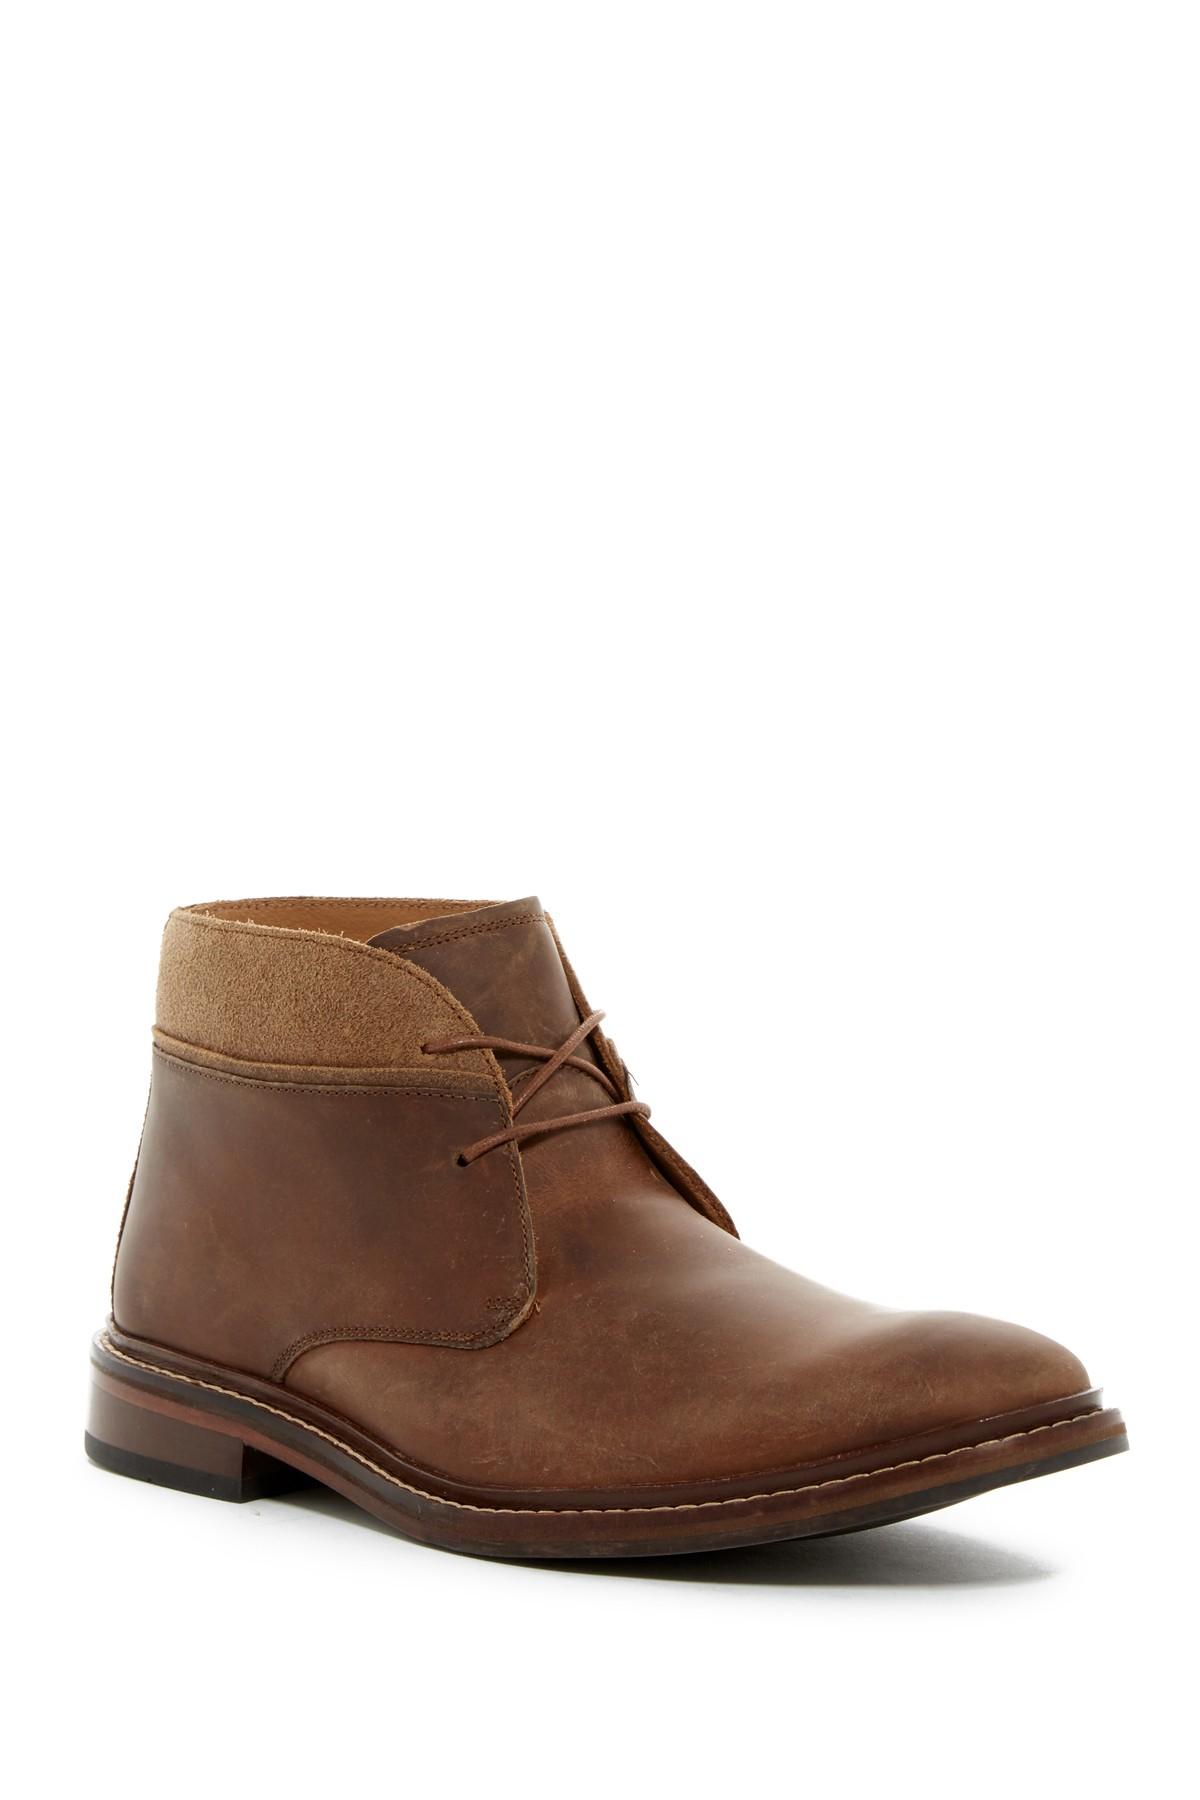 Cole Haan Benton Welt Chukka Boot Wide Width Available